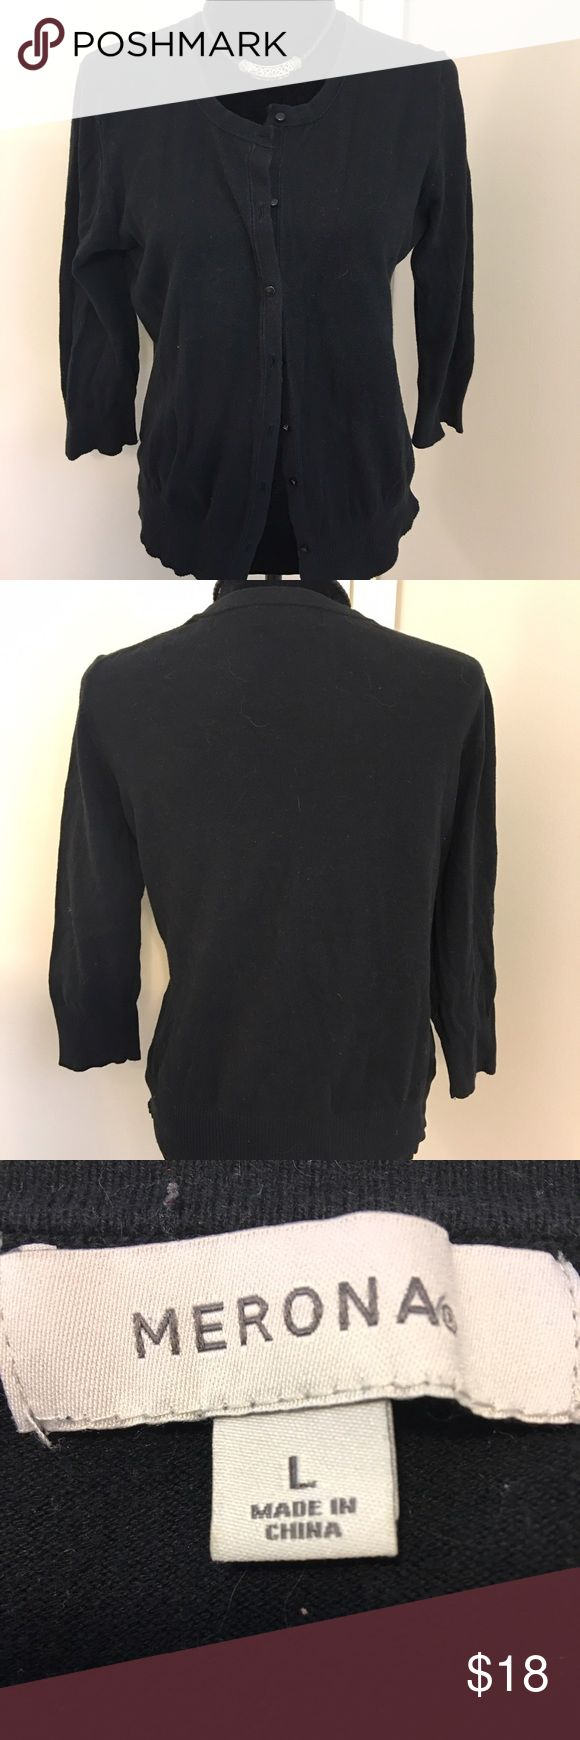 Merona black button up cardigan🎈FLASHSALE🎈 Merona black button up cardigan- tiny black buttons make this look very feminine. EUC. Merona Sweaters Cardigans